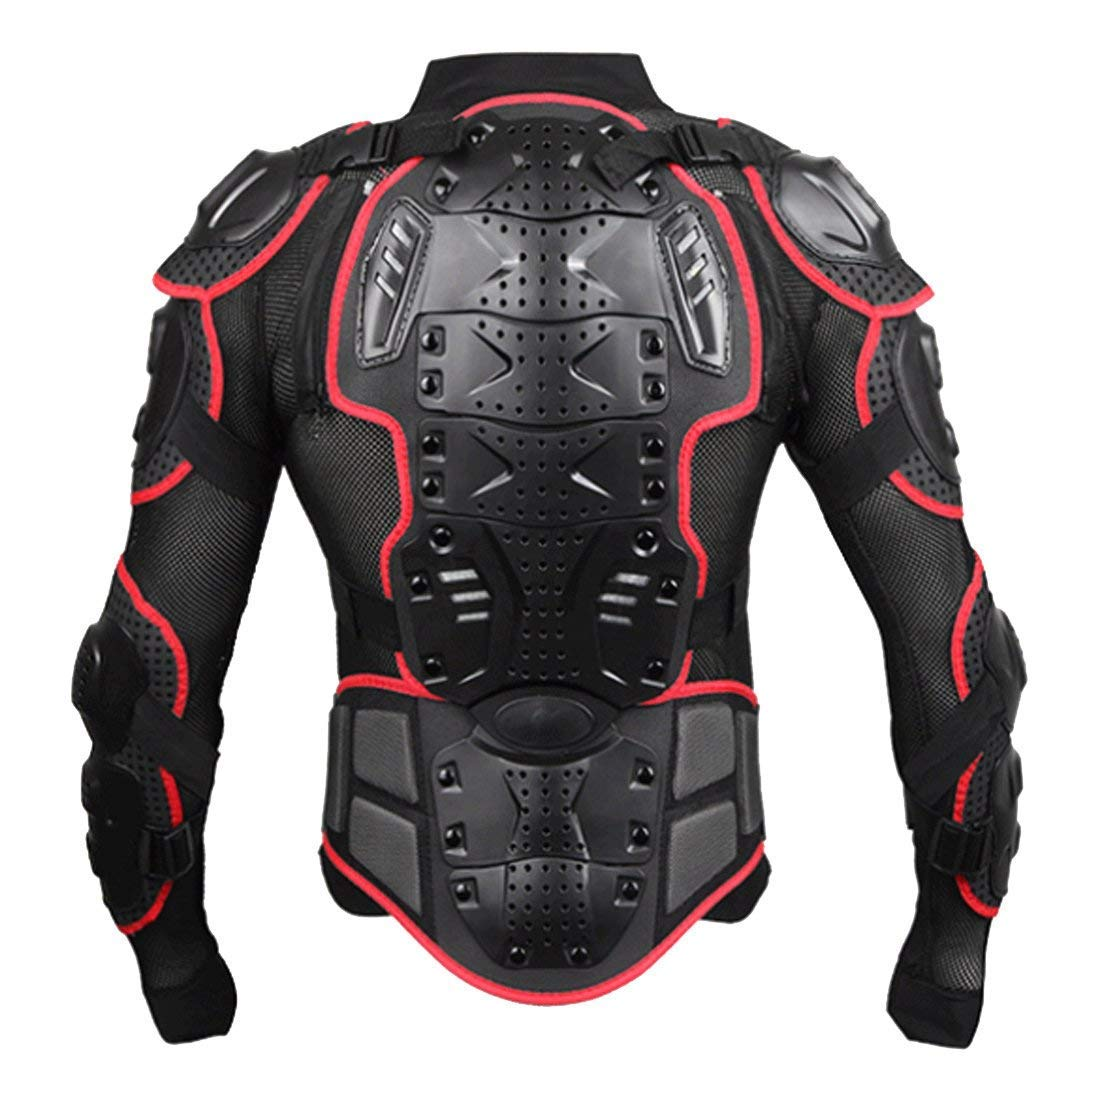 Moto Cross Enduro Motocicleta Chaqueta Protectora para La A ...